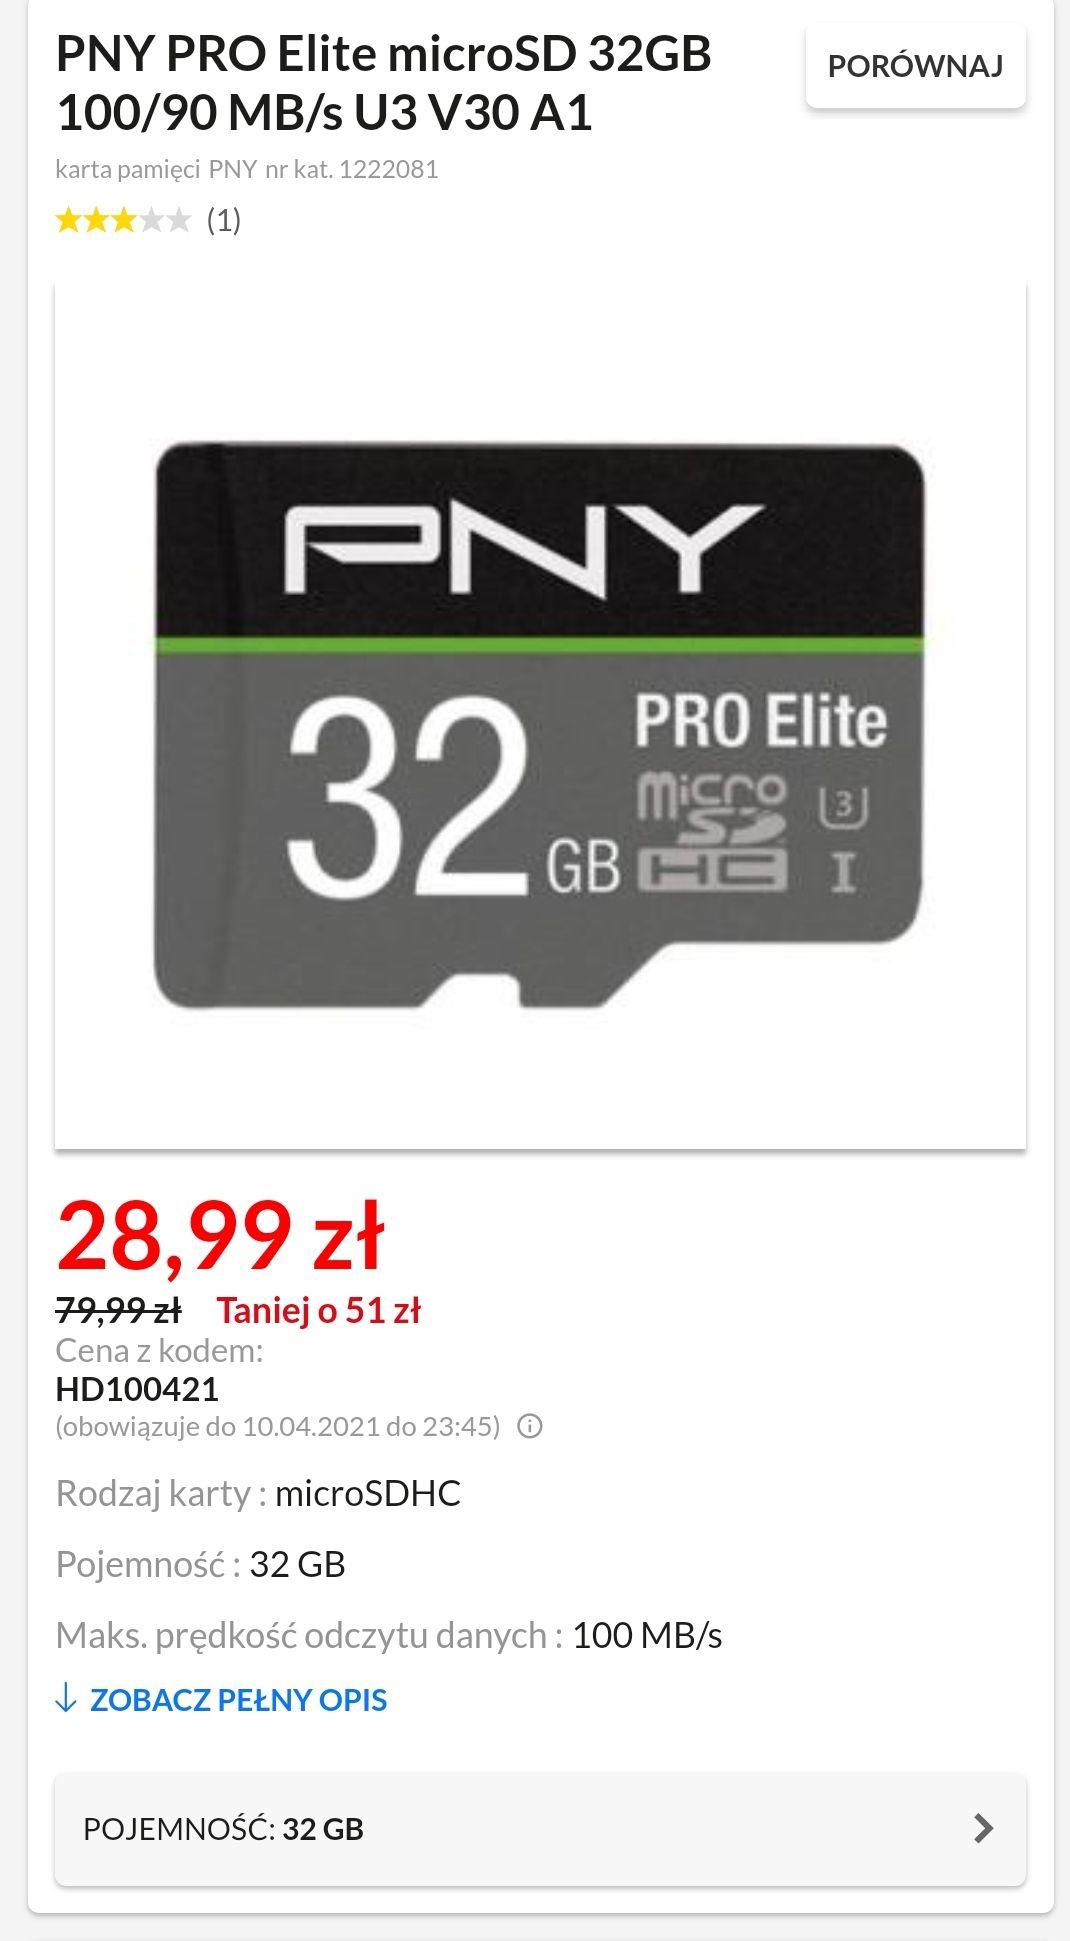 Karta pamięci PNY PRO Elite microSD 32GB 100/90 MB/s U3 V30 A1